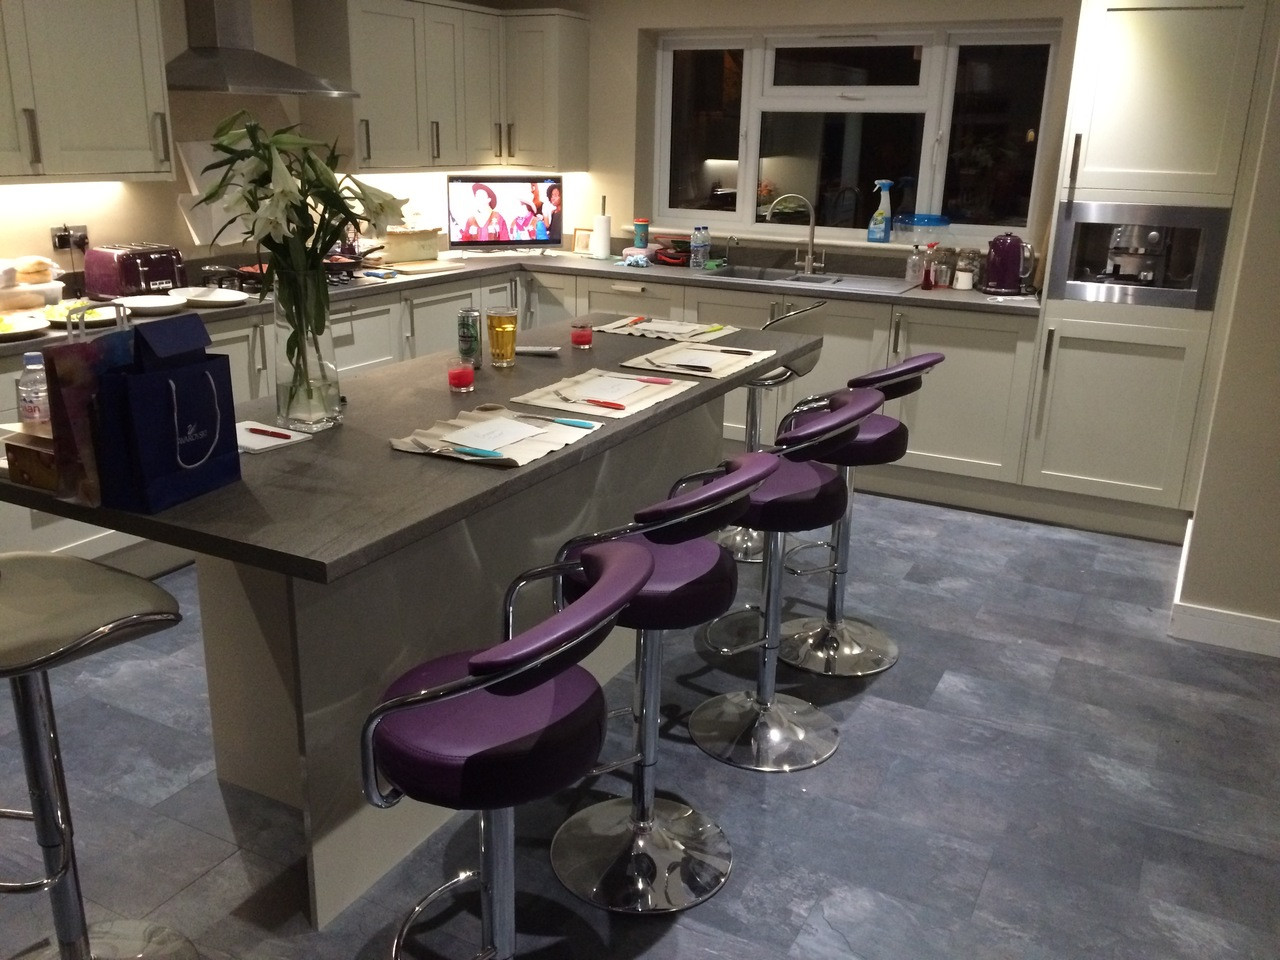 Zenith Purple Bar Stool Breakfast Bar Stool : zenithpurple0103278611499771253 from www.simplybarstools.co.uk size 1280 x 960 jpeg 302kB